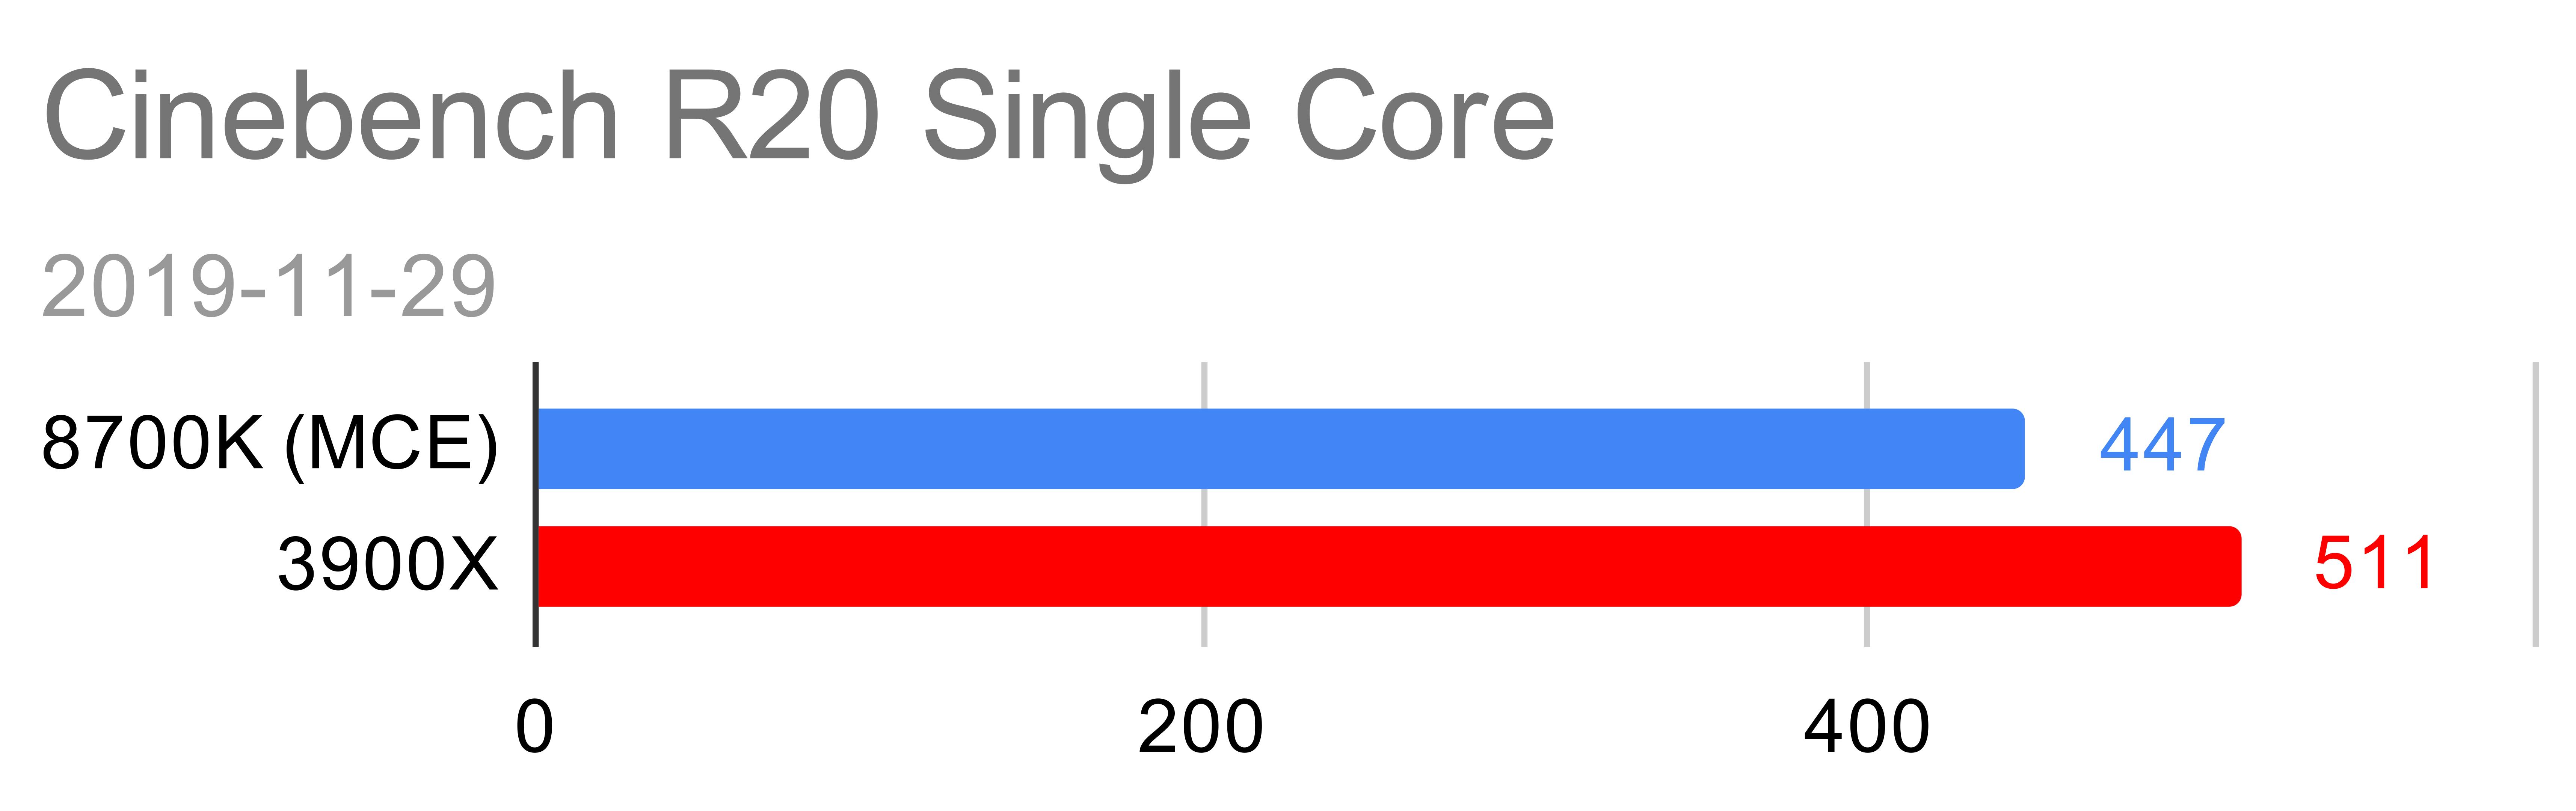 Cinebench R20 Single Core